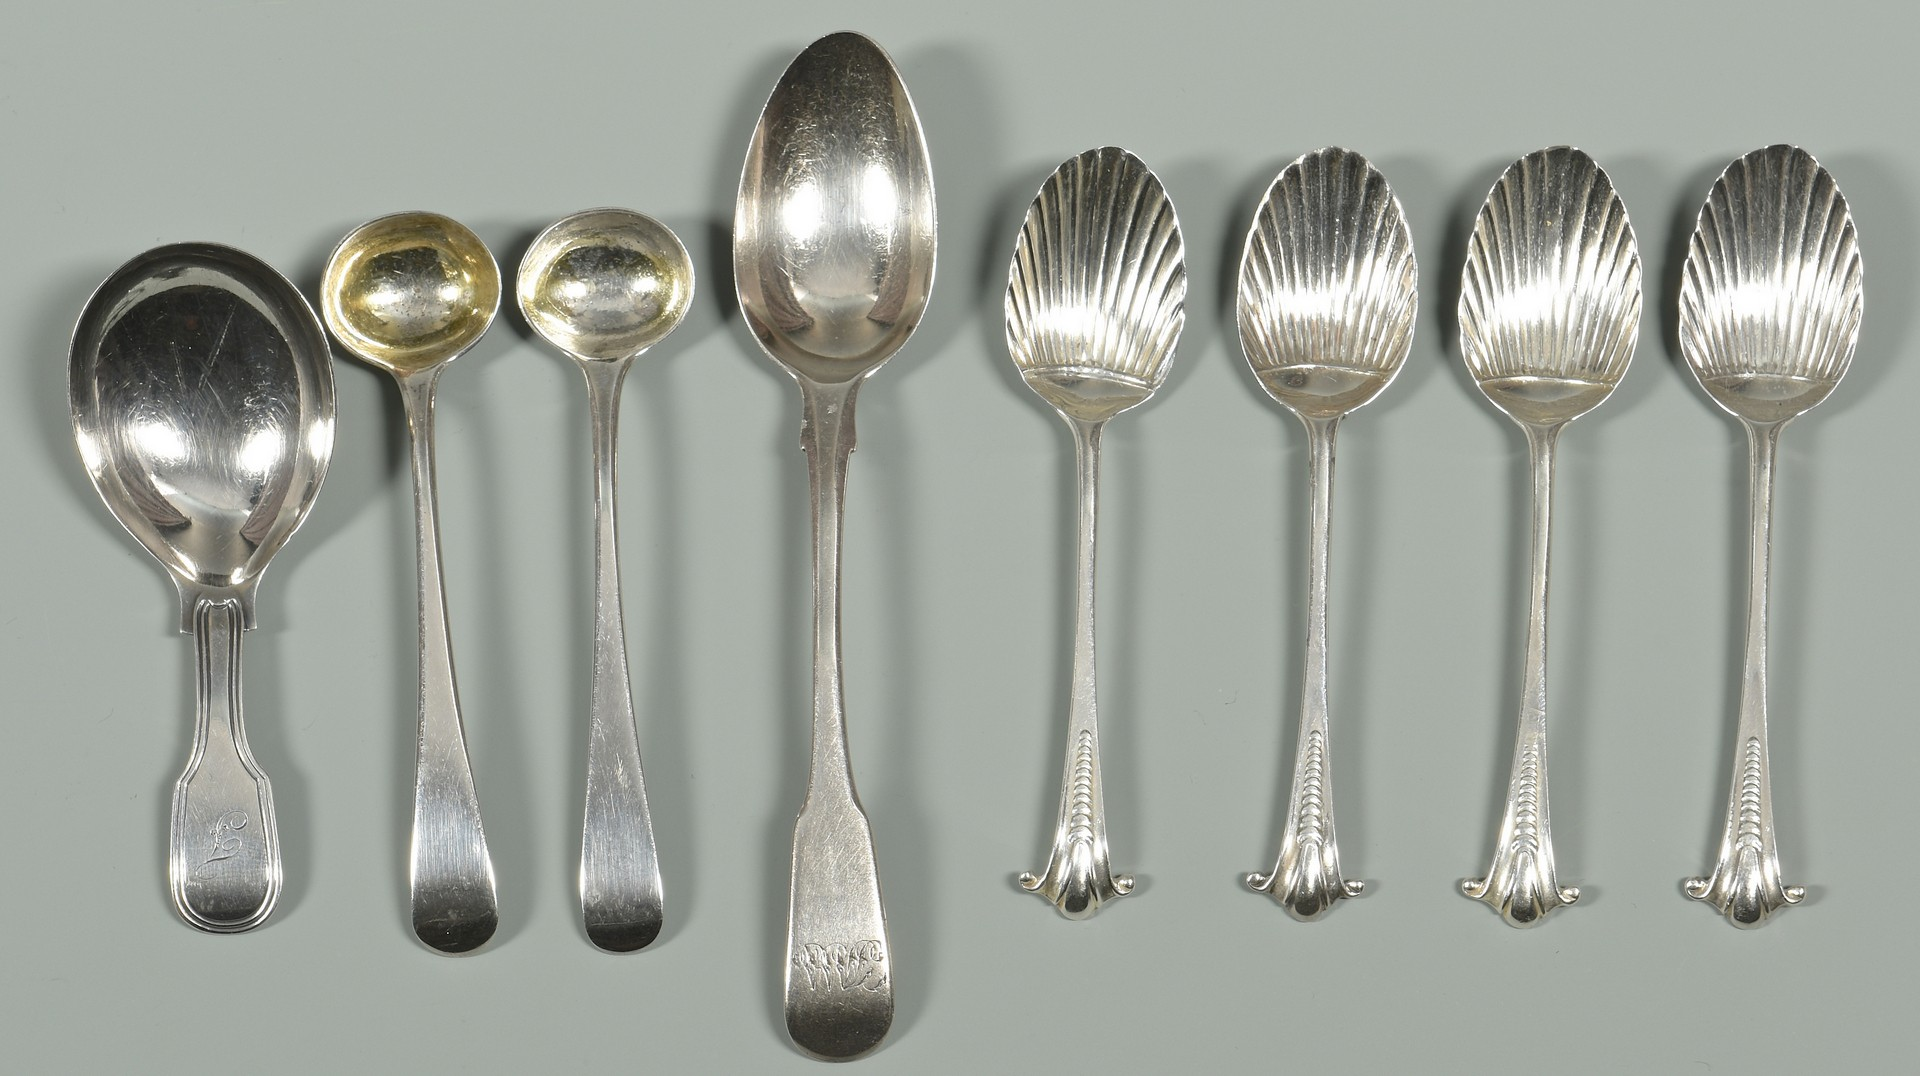 Lot 338: Assorted London Silver Flatware, 18 pcs